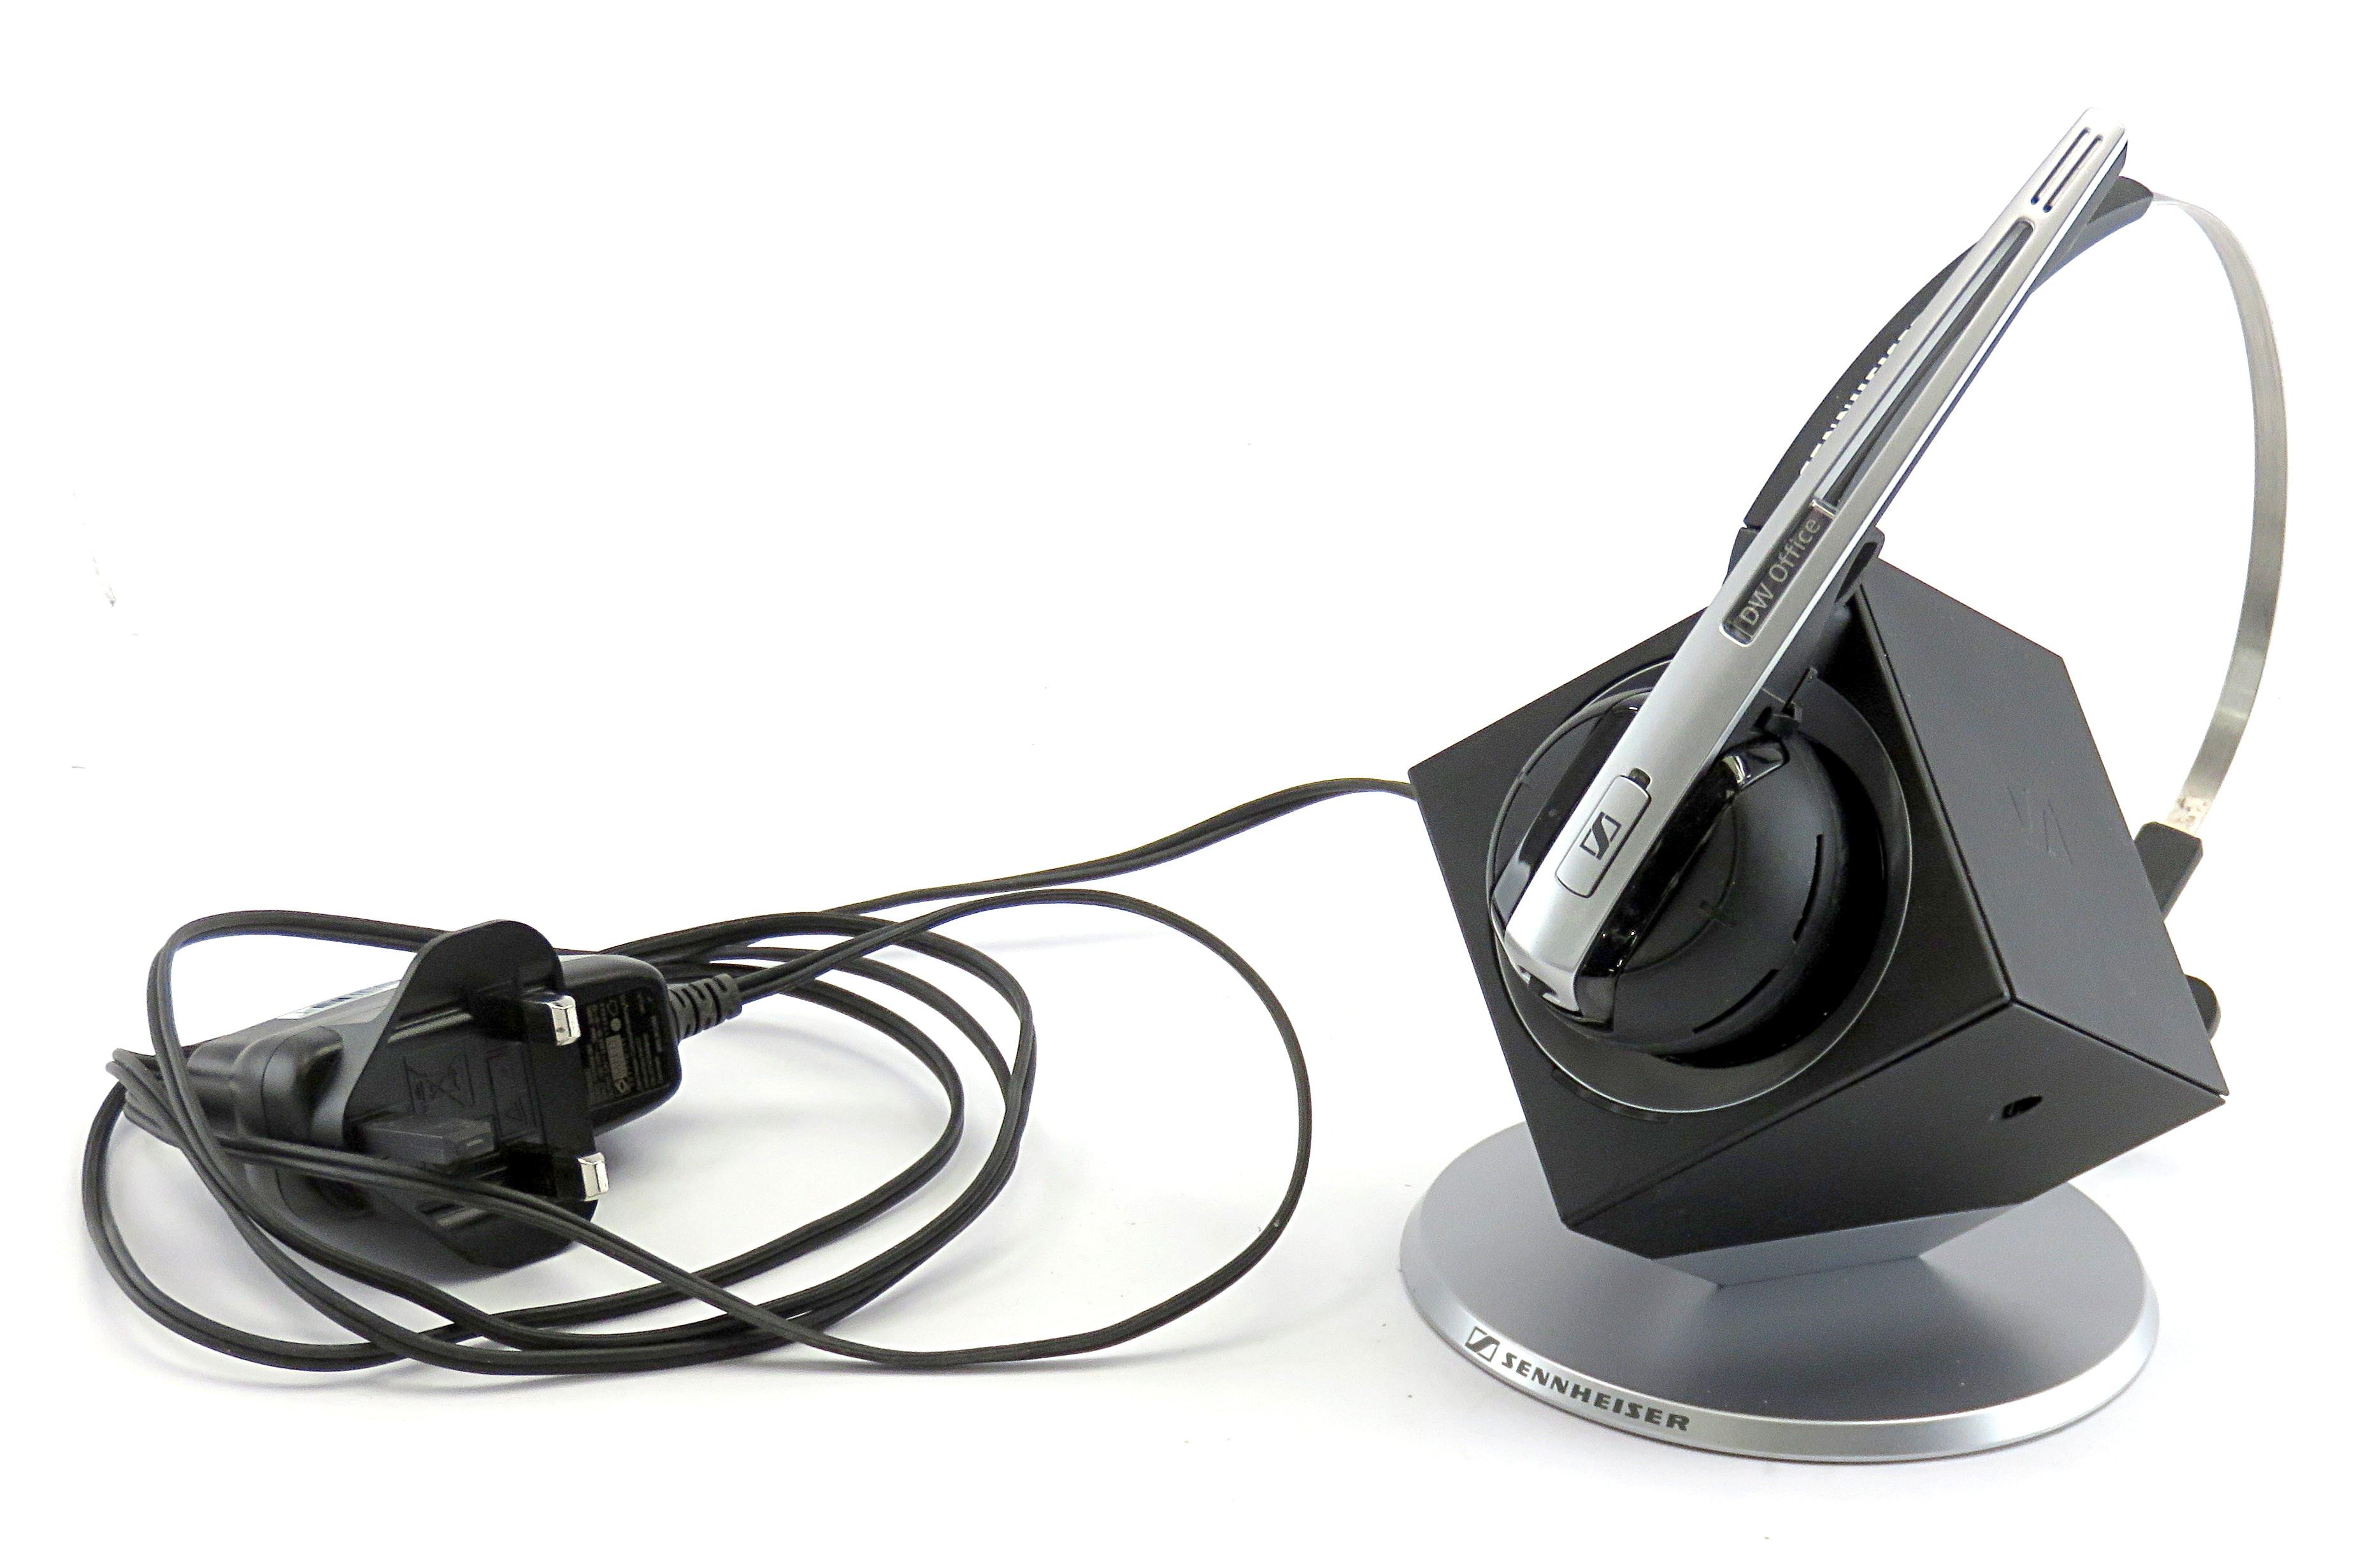 Sennheiser DW Office DECT Telephony Wireless Headset System